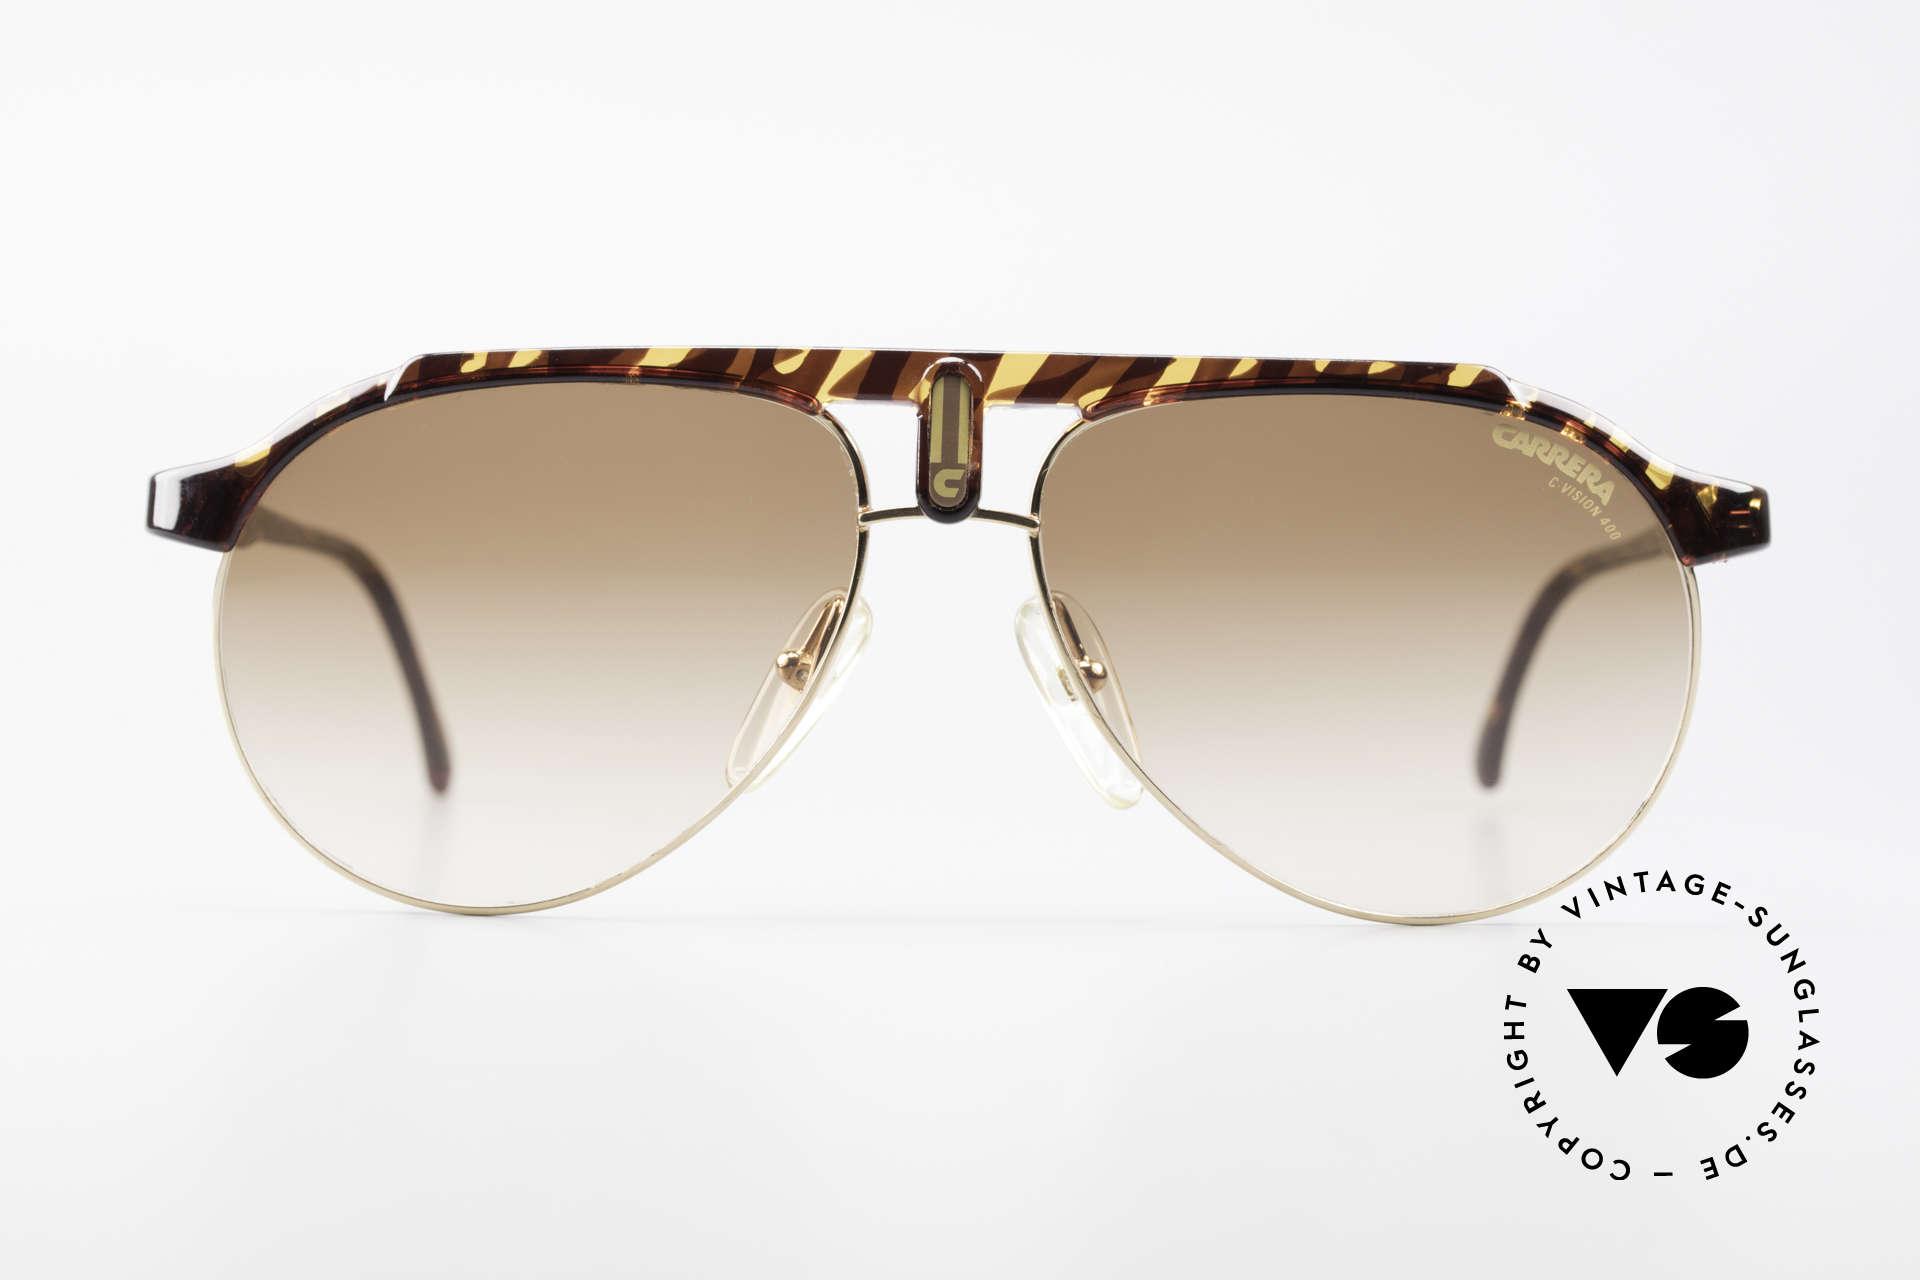 6a7ee863bbb3f Sonnenbrillen Carrera 5478 80er Vintage Sonnenbrille